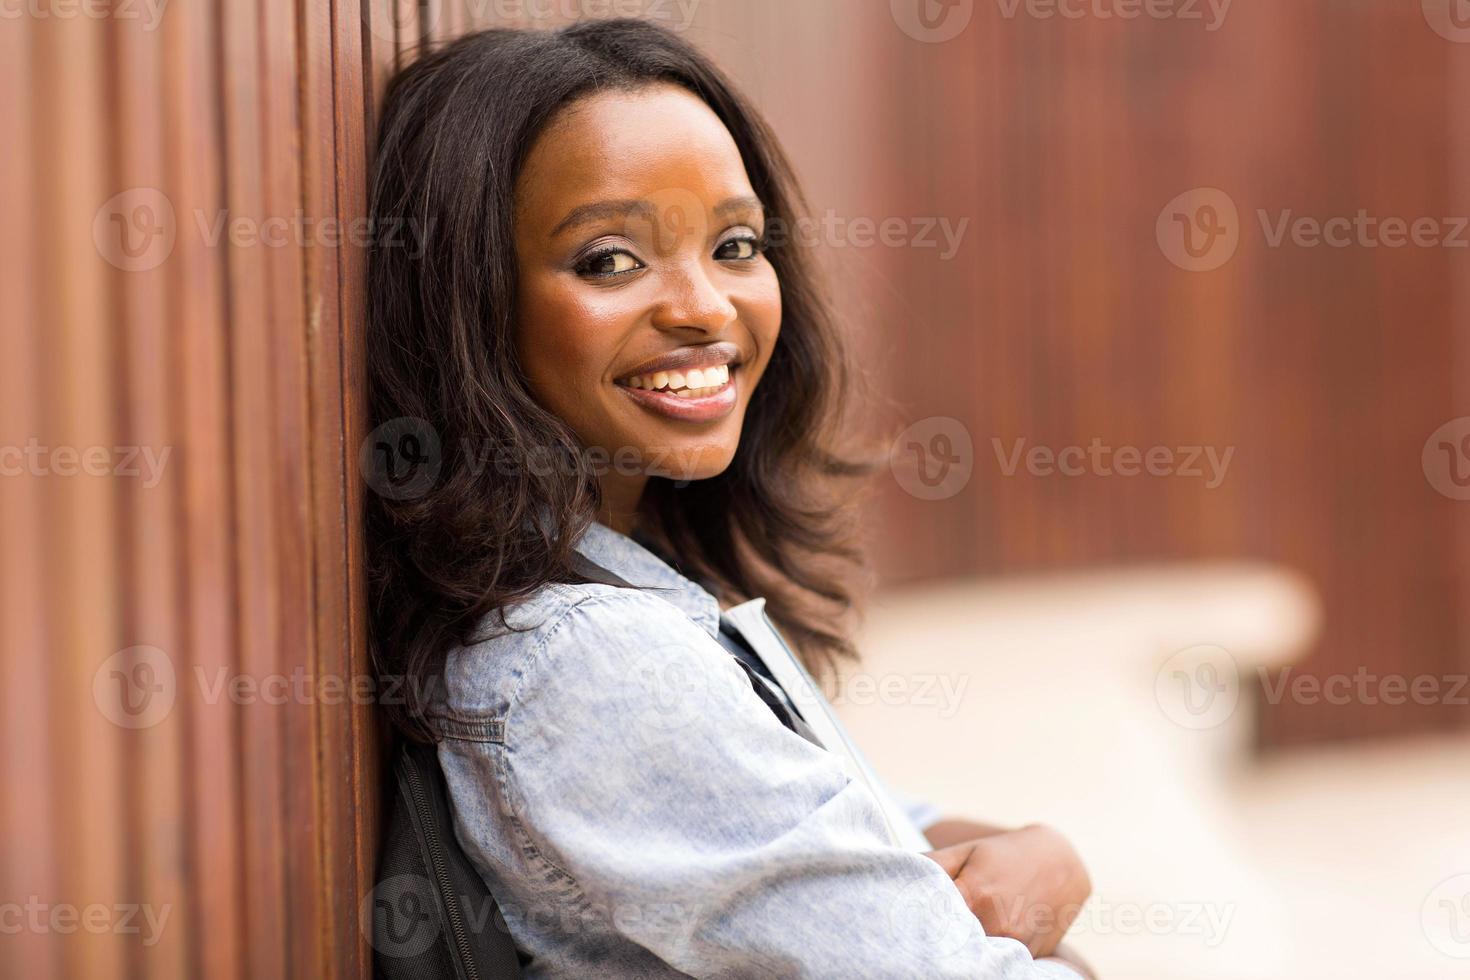 Retrato de joven universitaria afroamericana foto